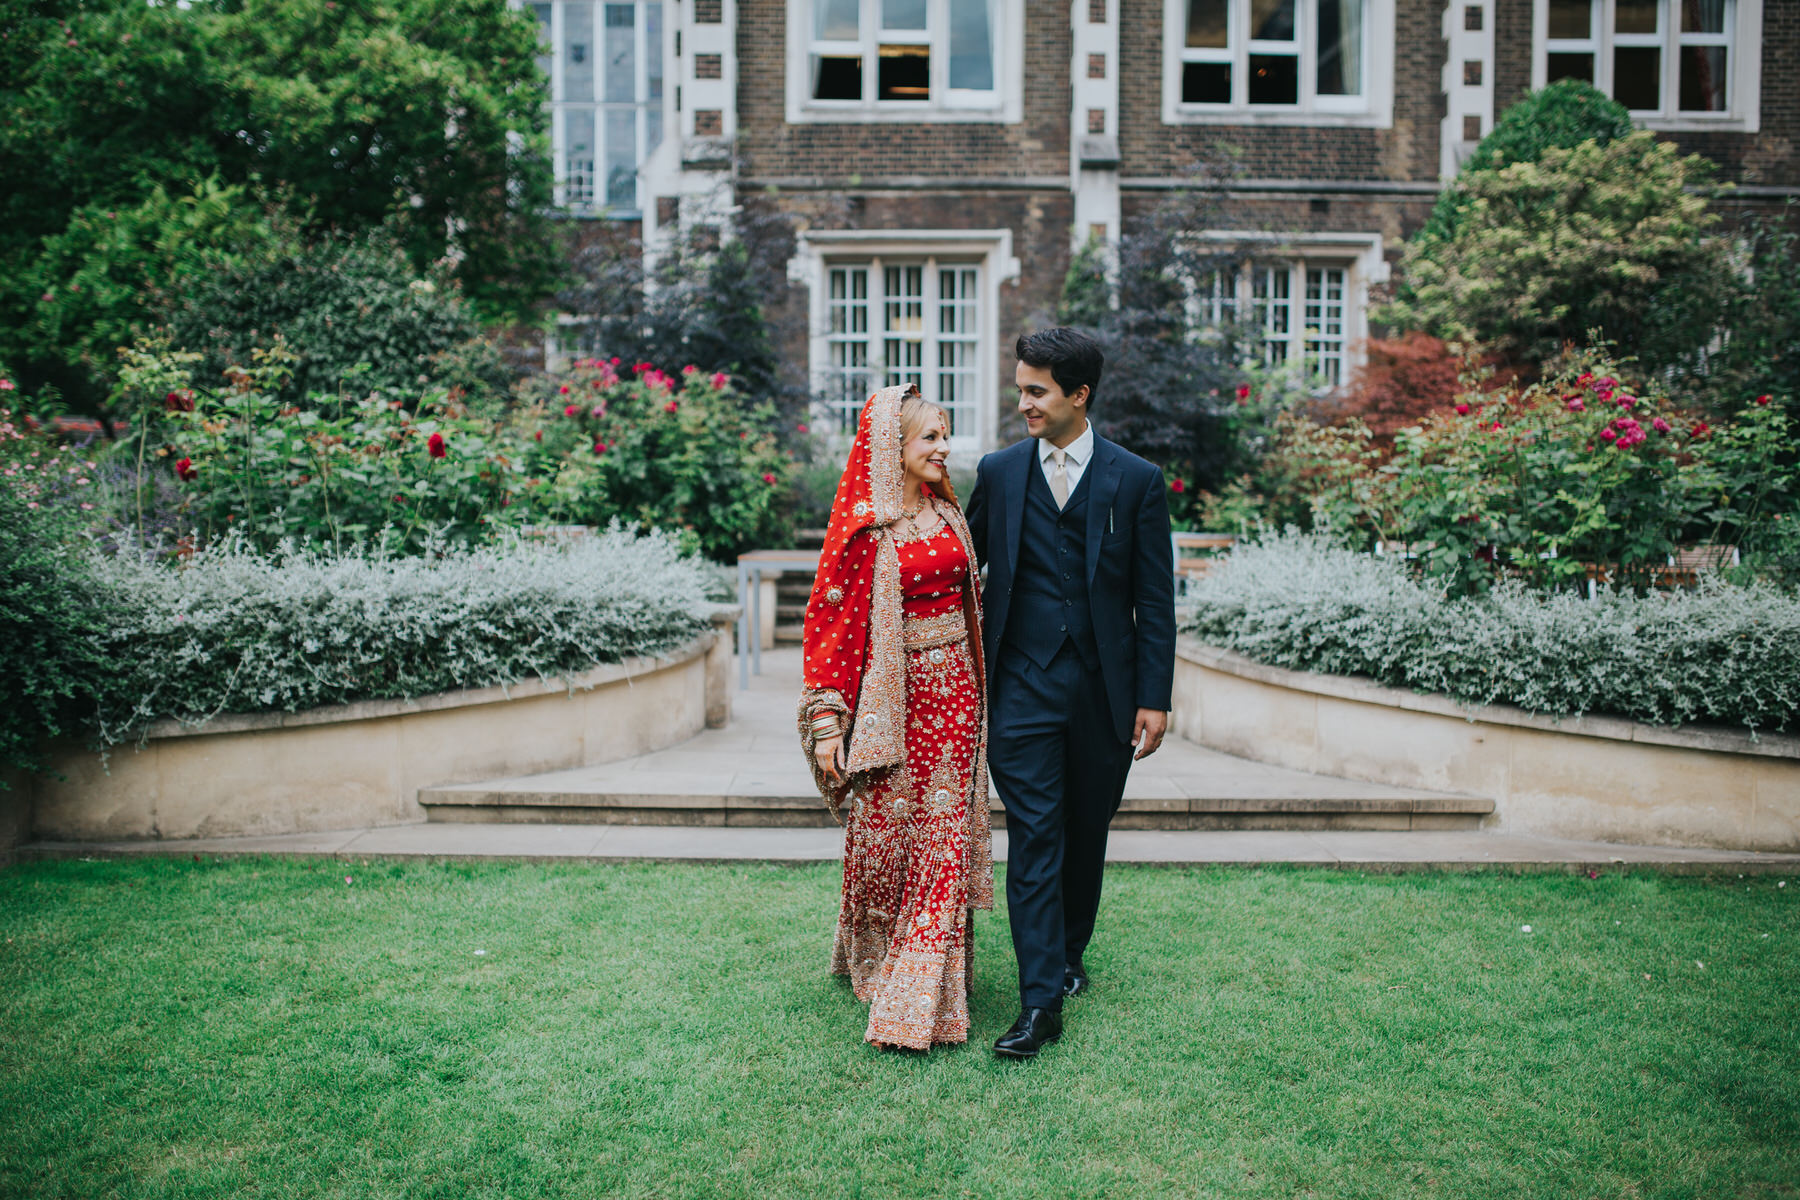 44-Anglo-Asian-London-Wedding-Middle-temple-bride-groom-walking-garden.jpg